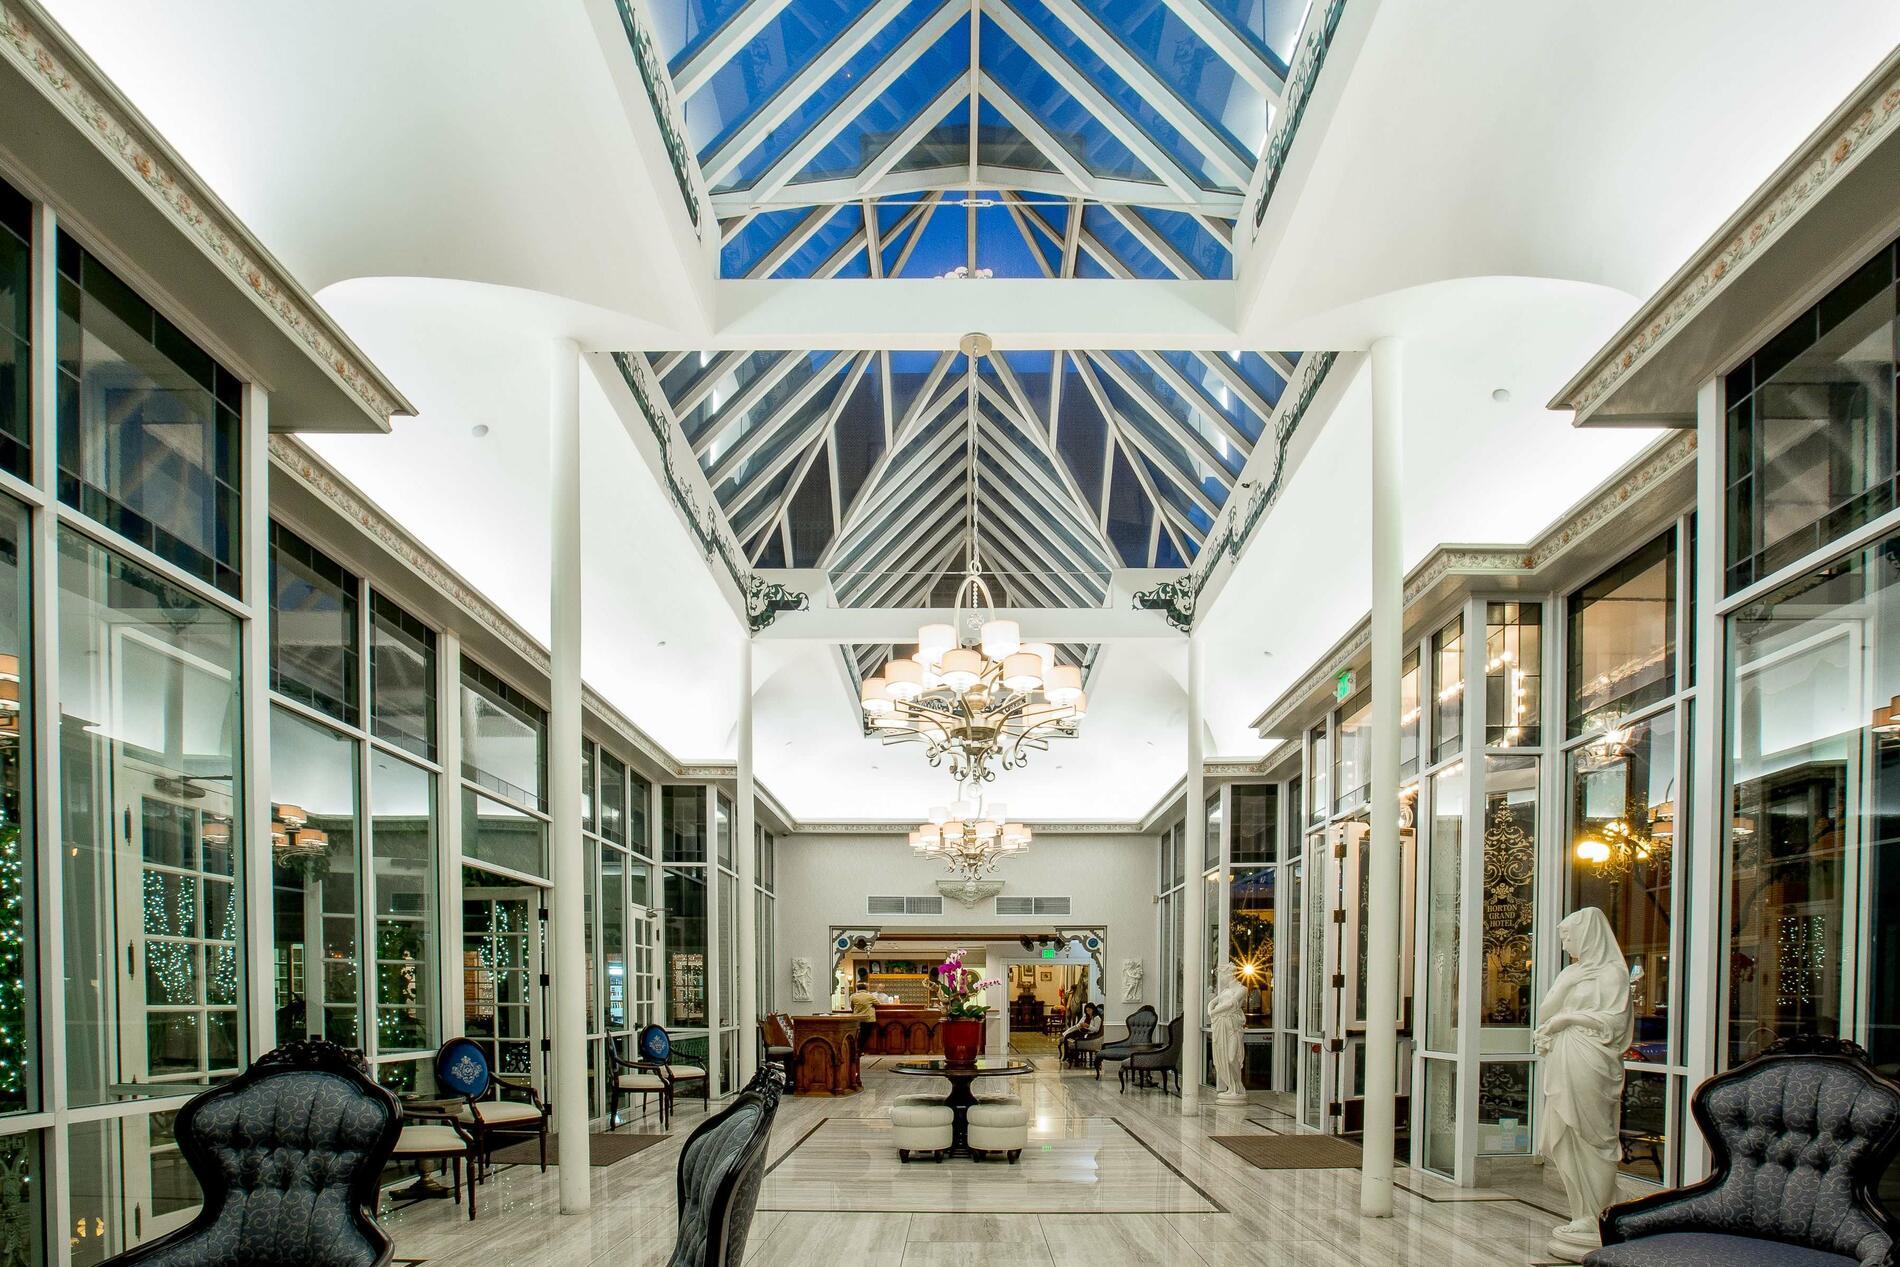 Hotel lobby with skylights